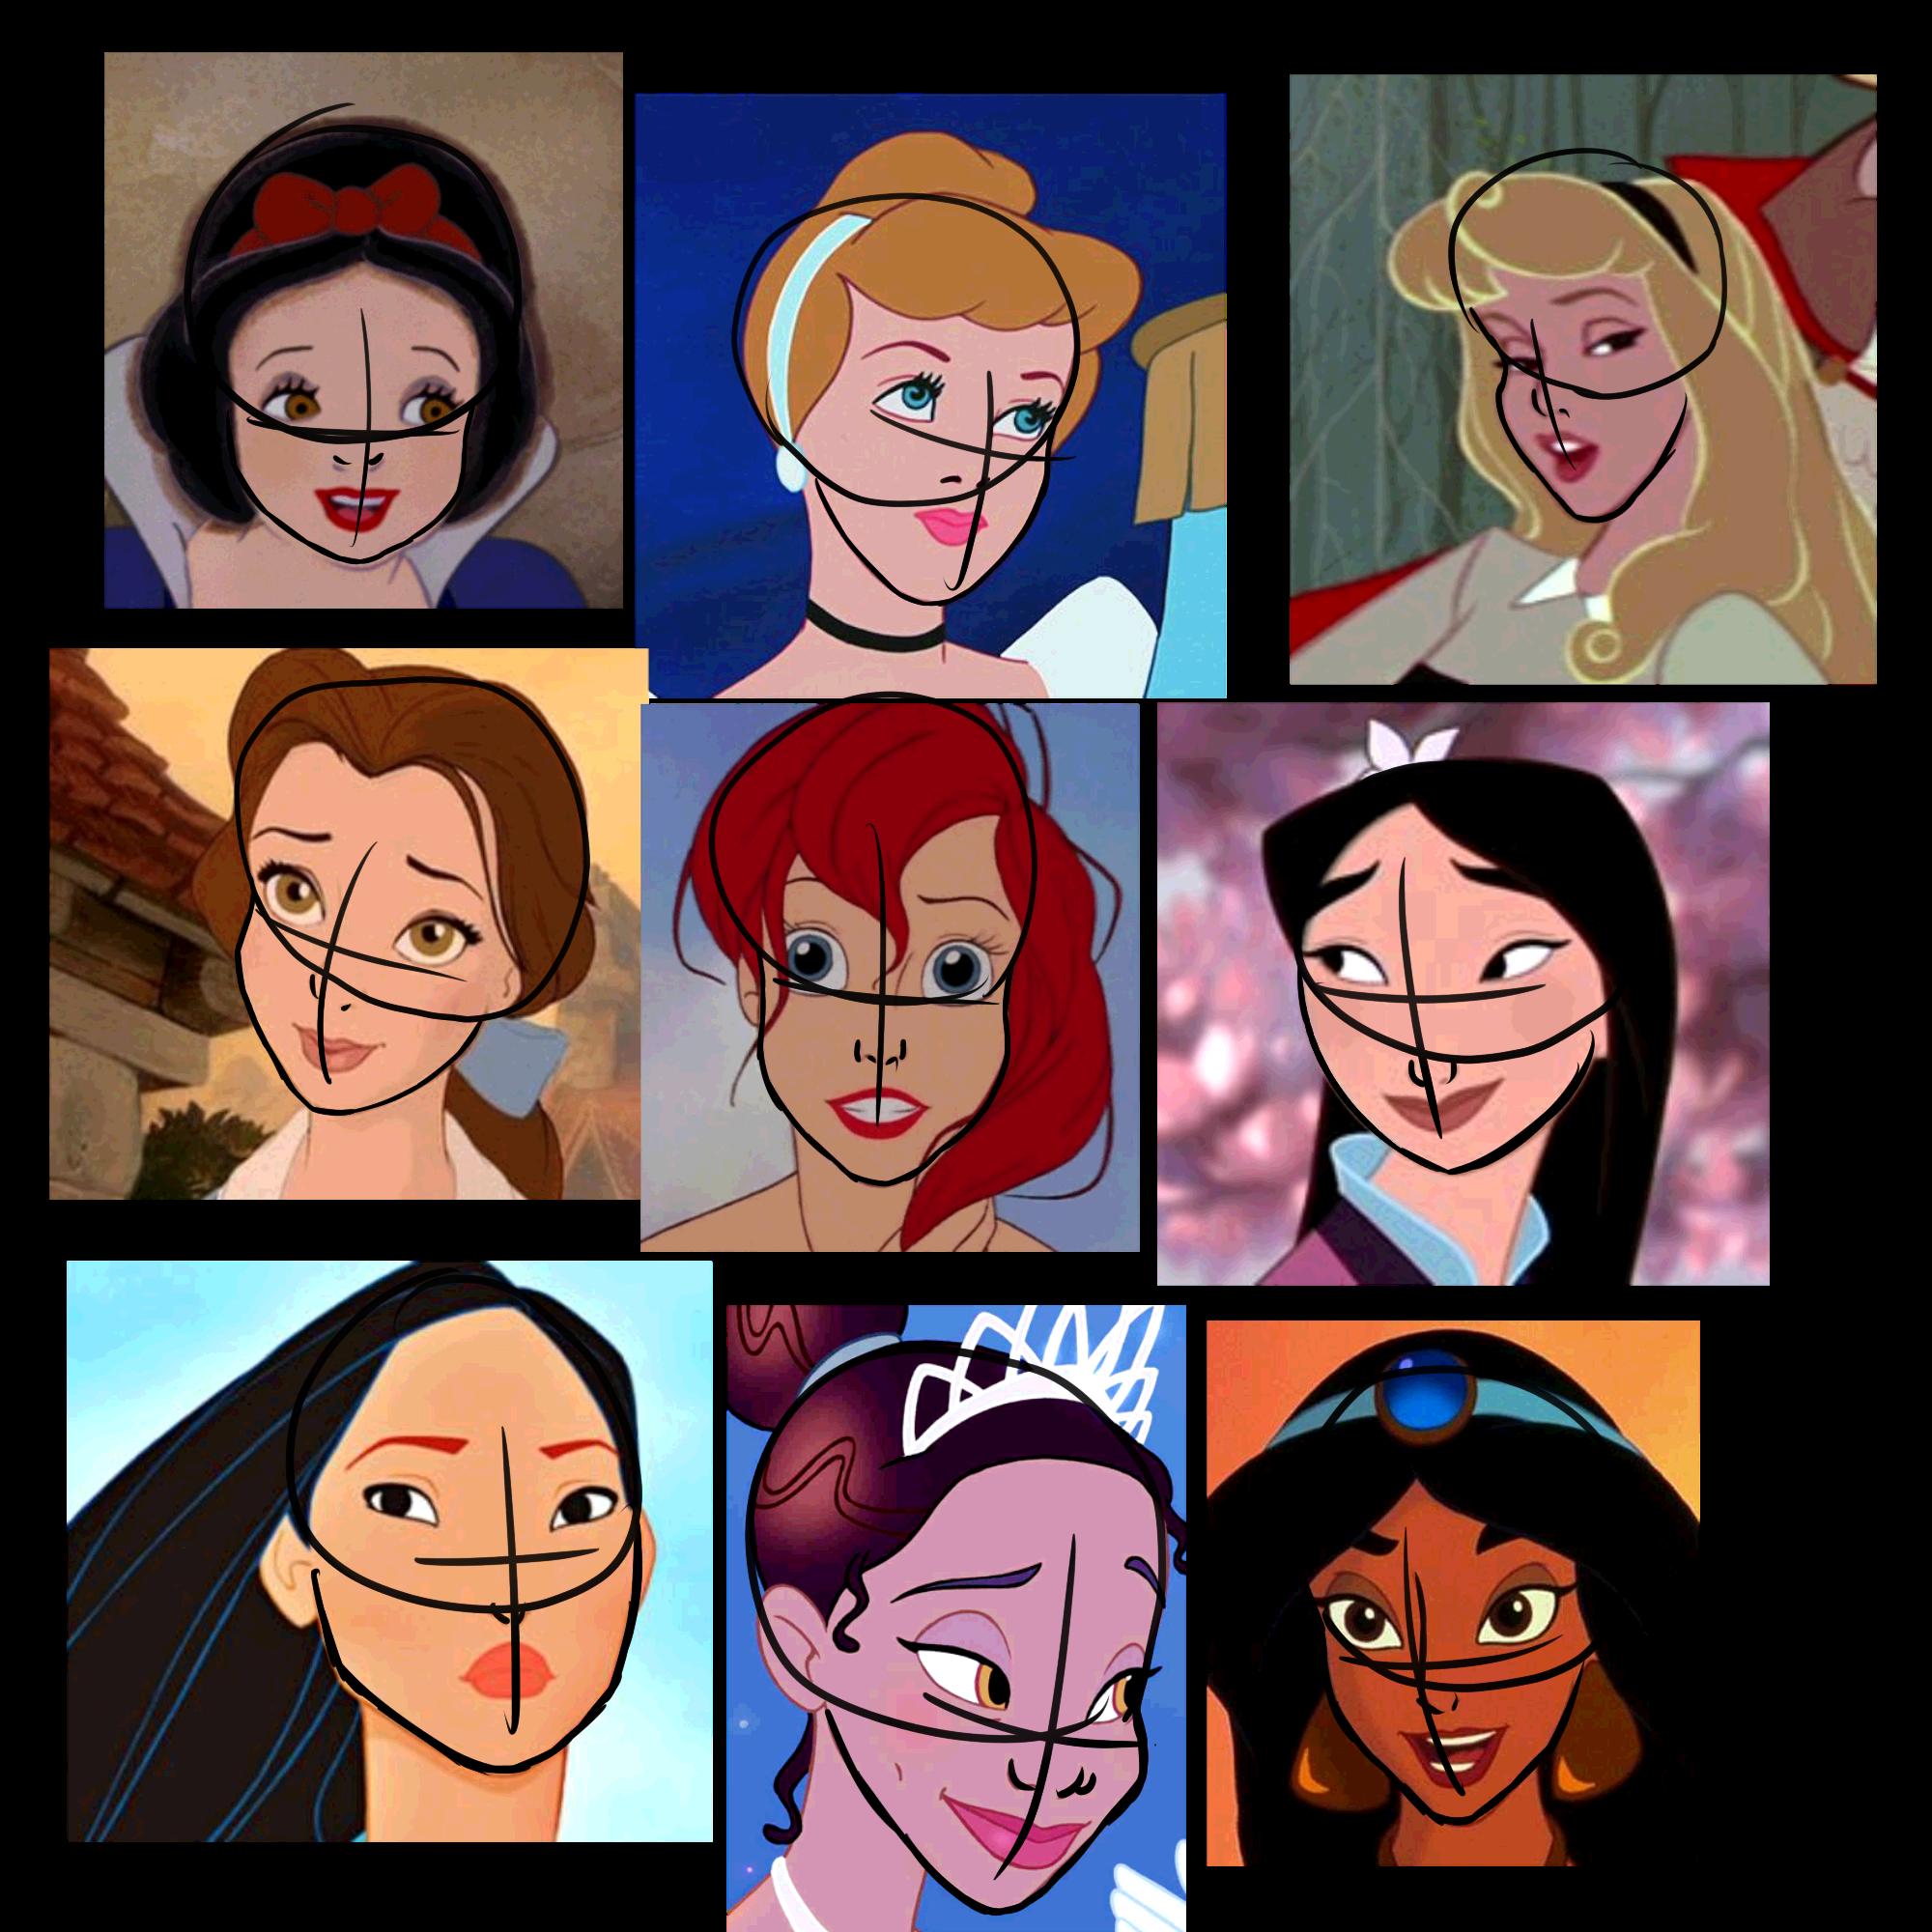 Disney Faces Sketch By Karen Donna On Deviantart